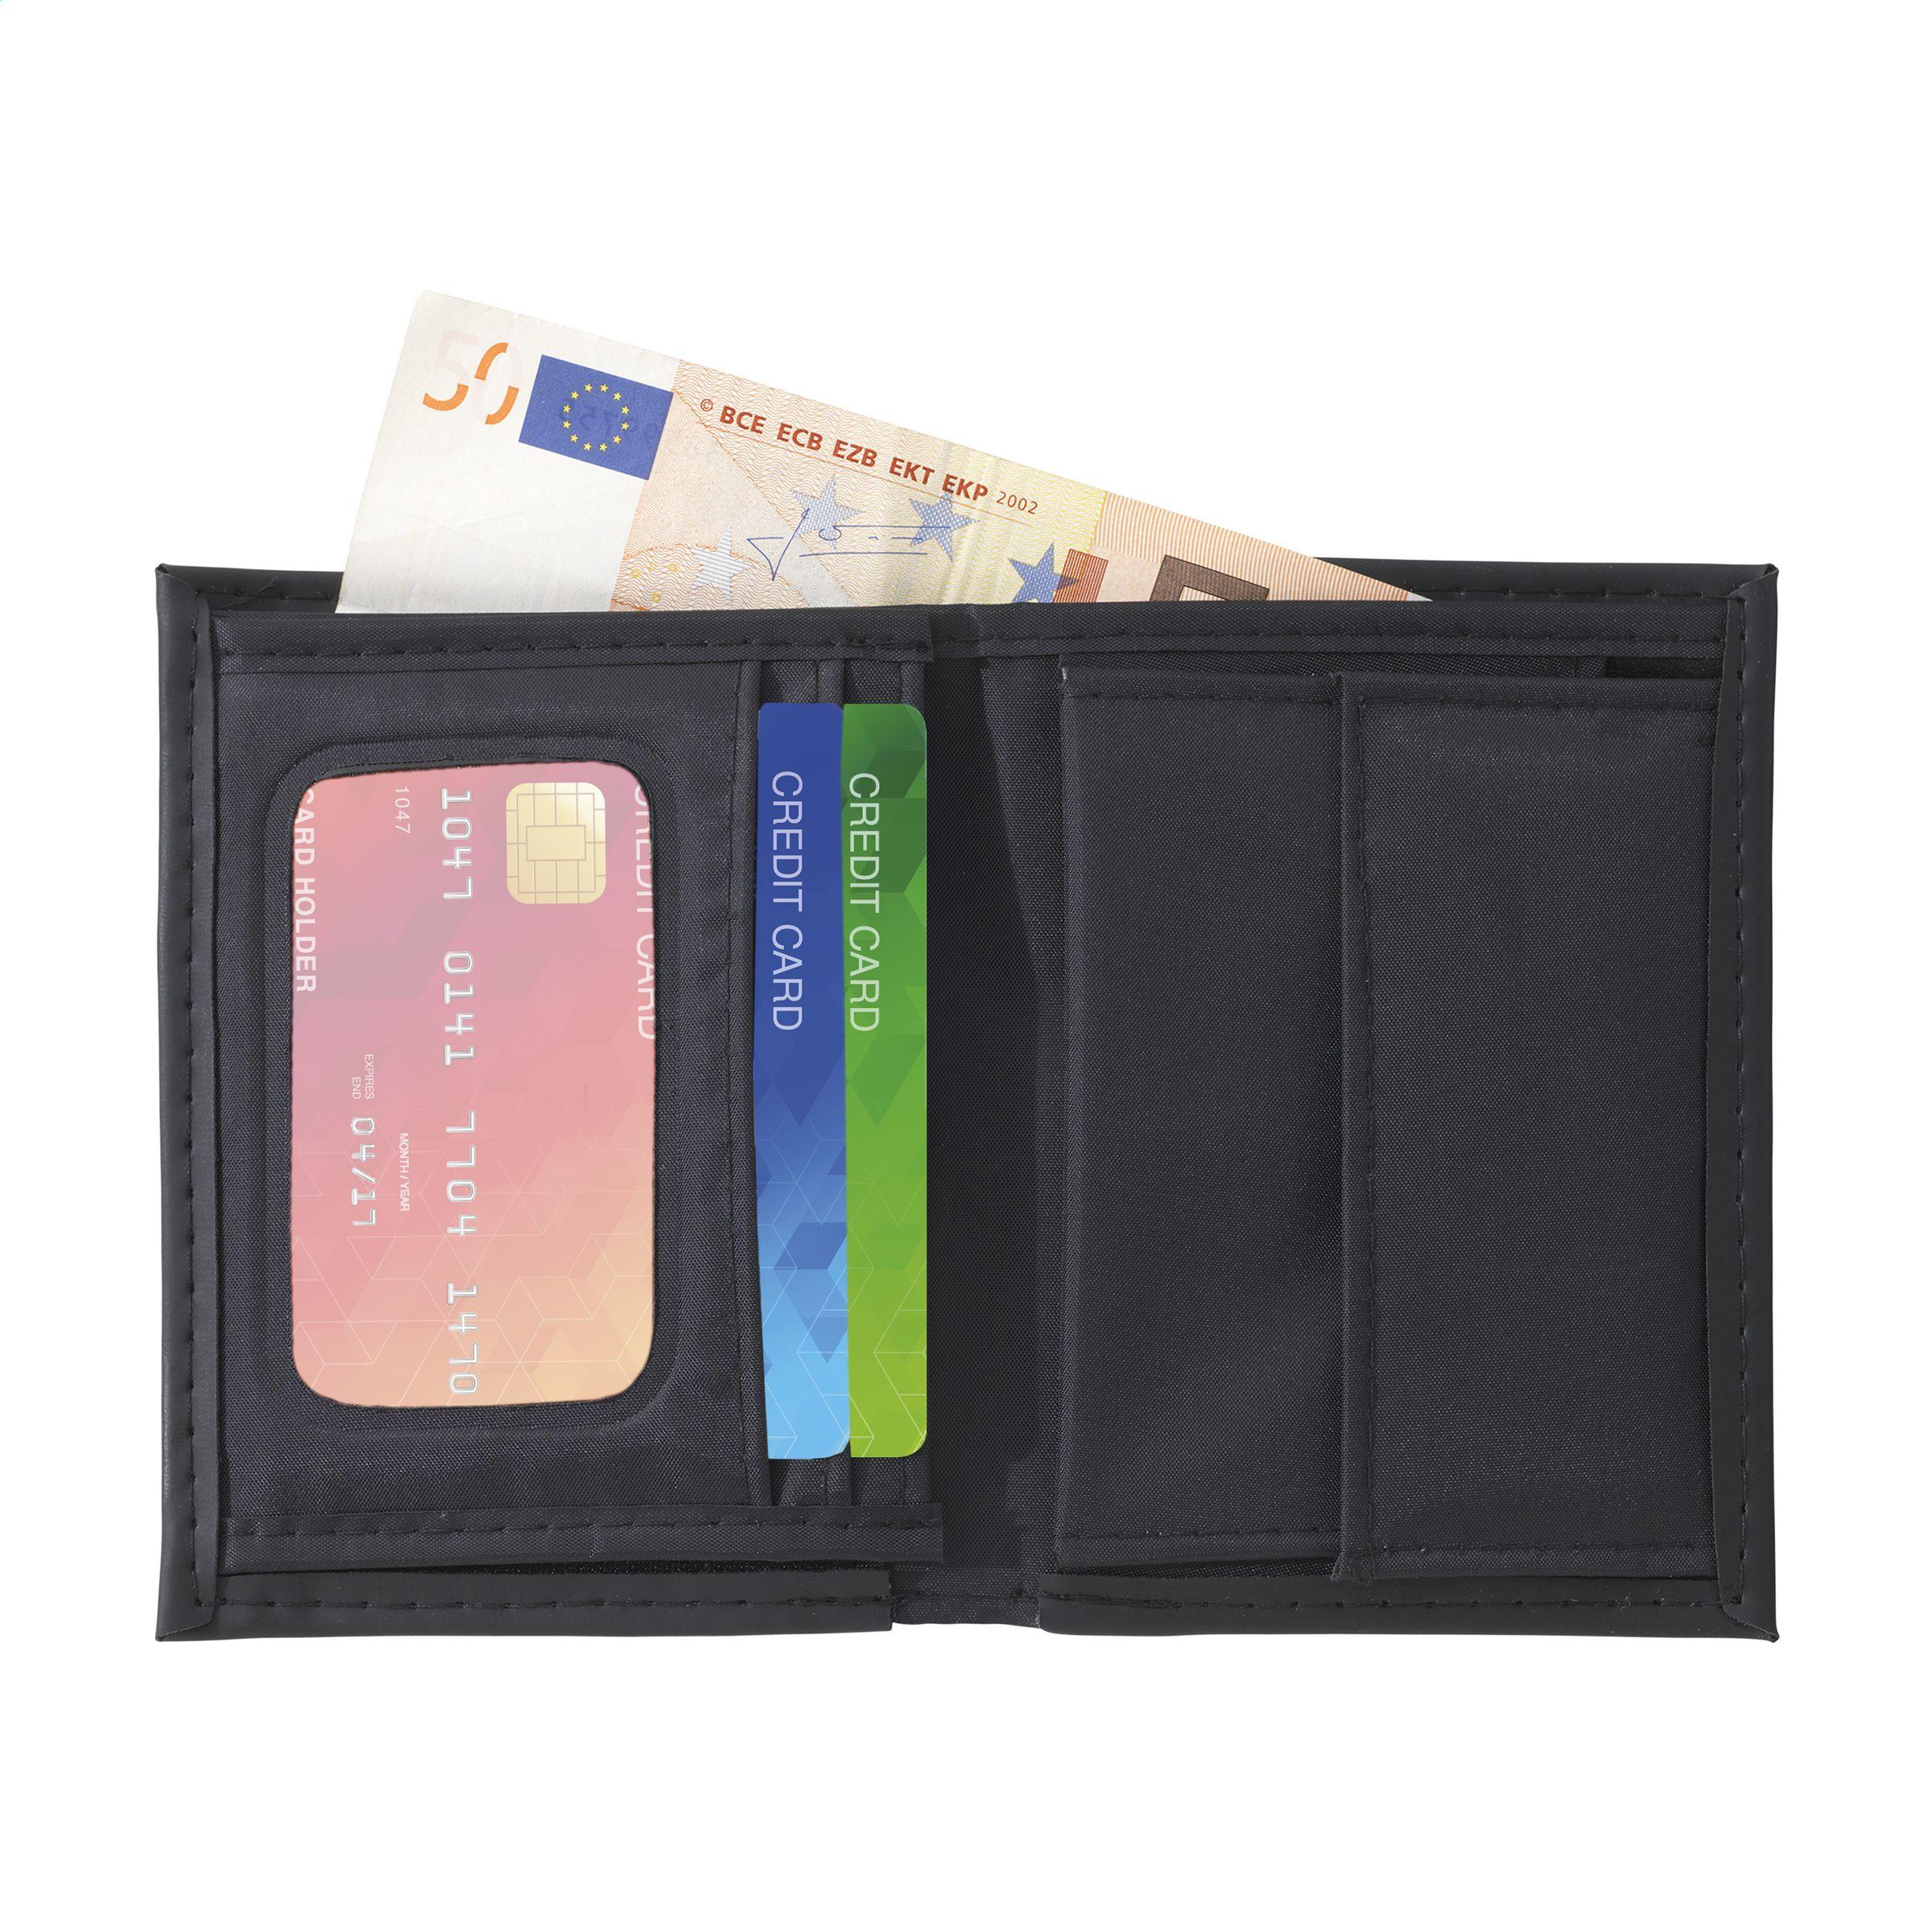 Blackstar wallet printing